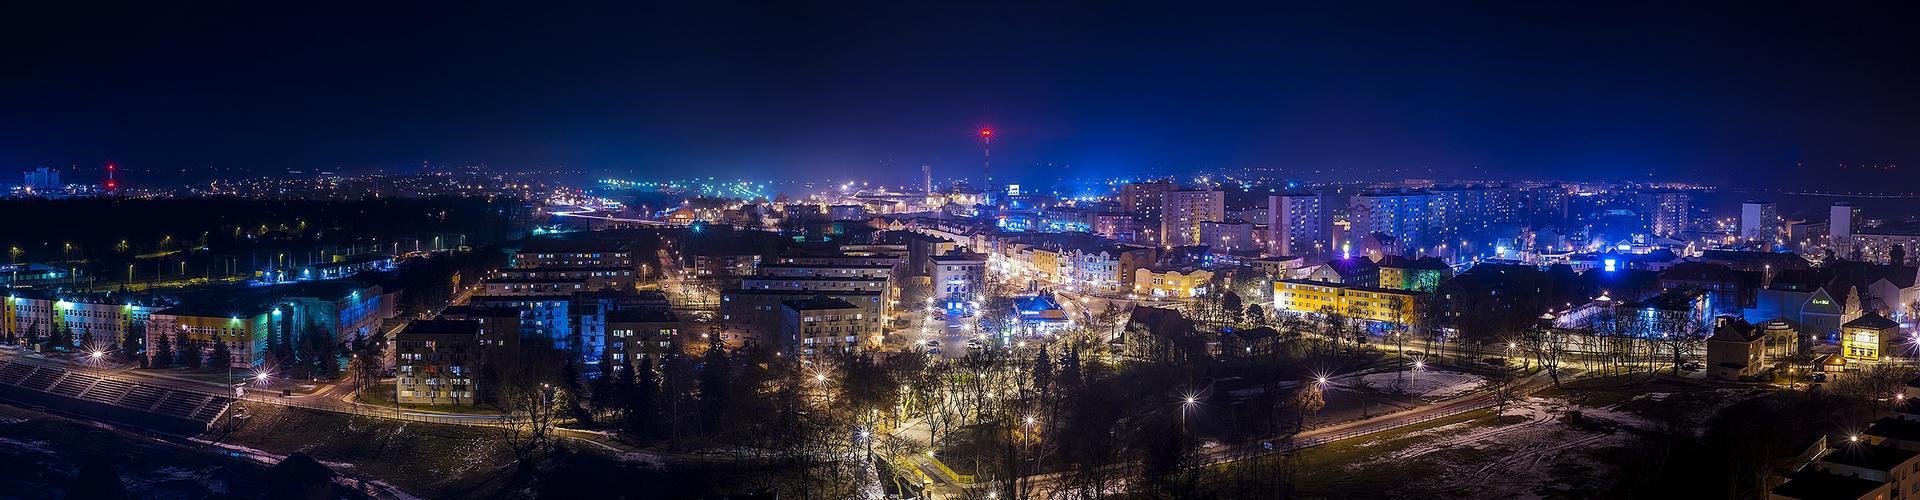 http://m.82-200.pl/2017/01/orig/mk-panorama-465.jpg